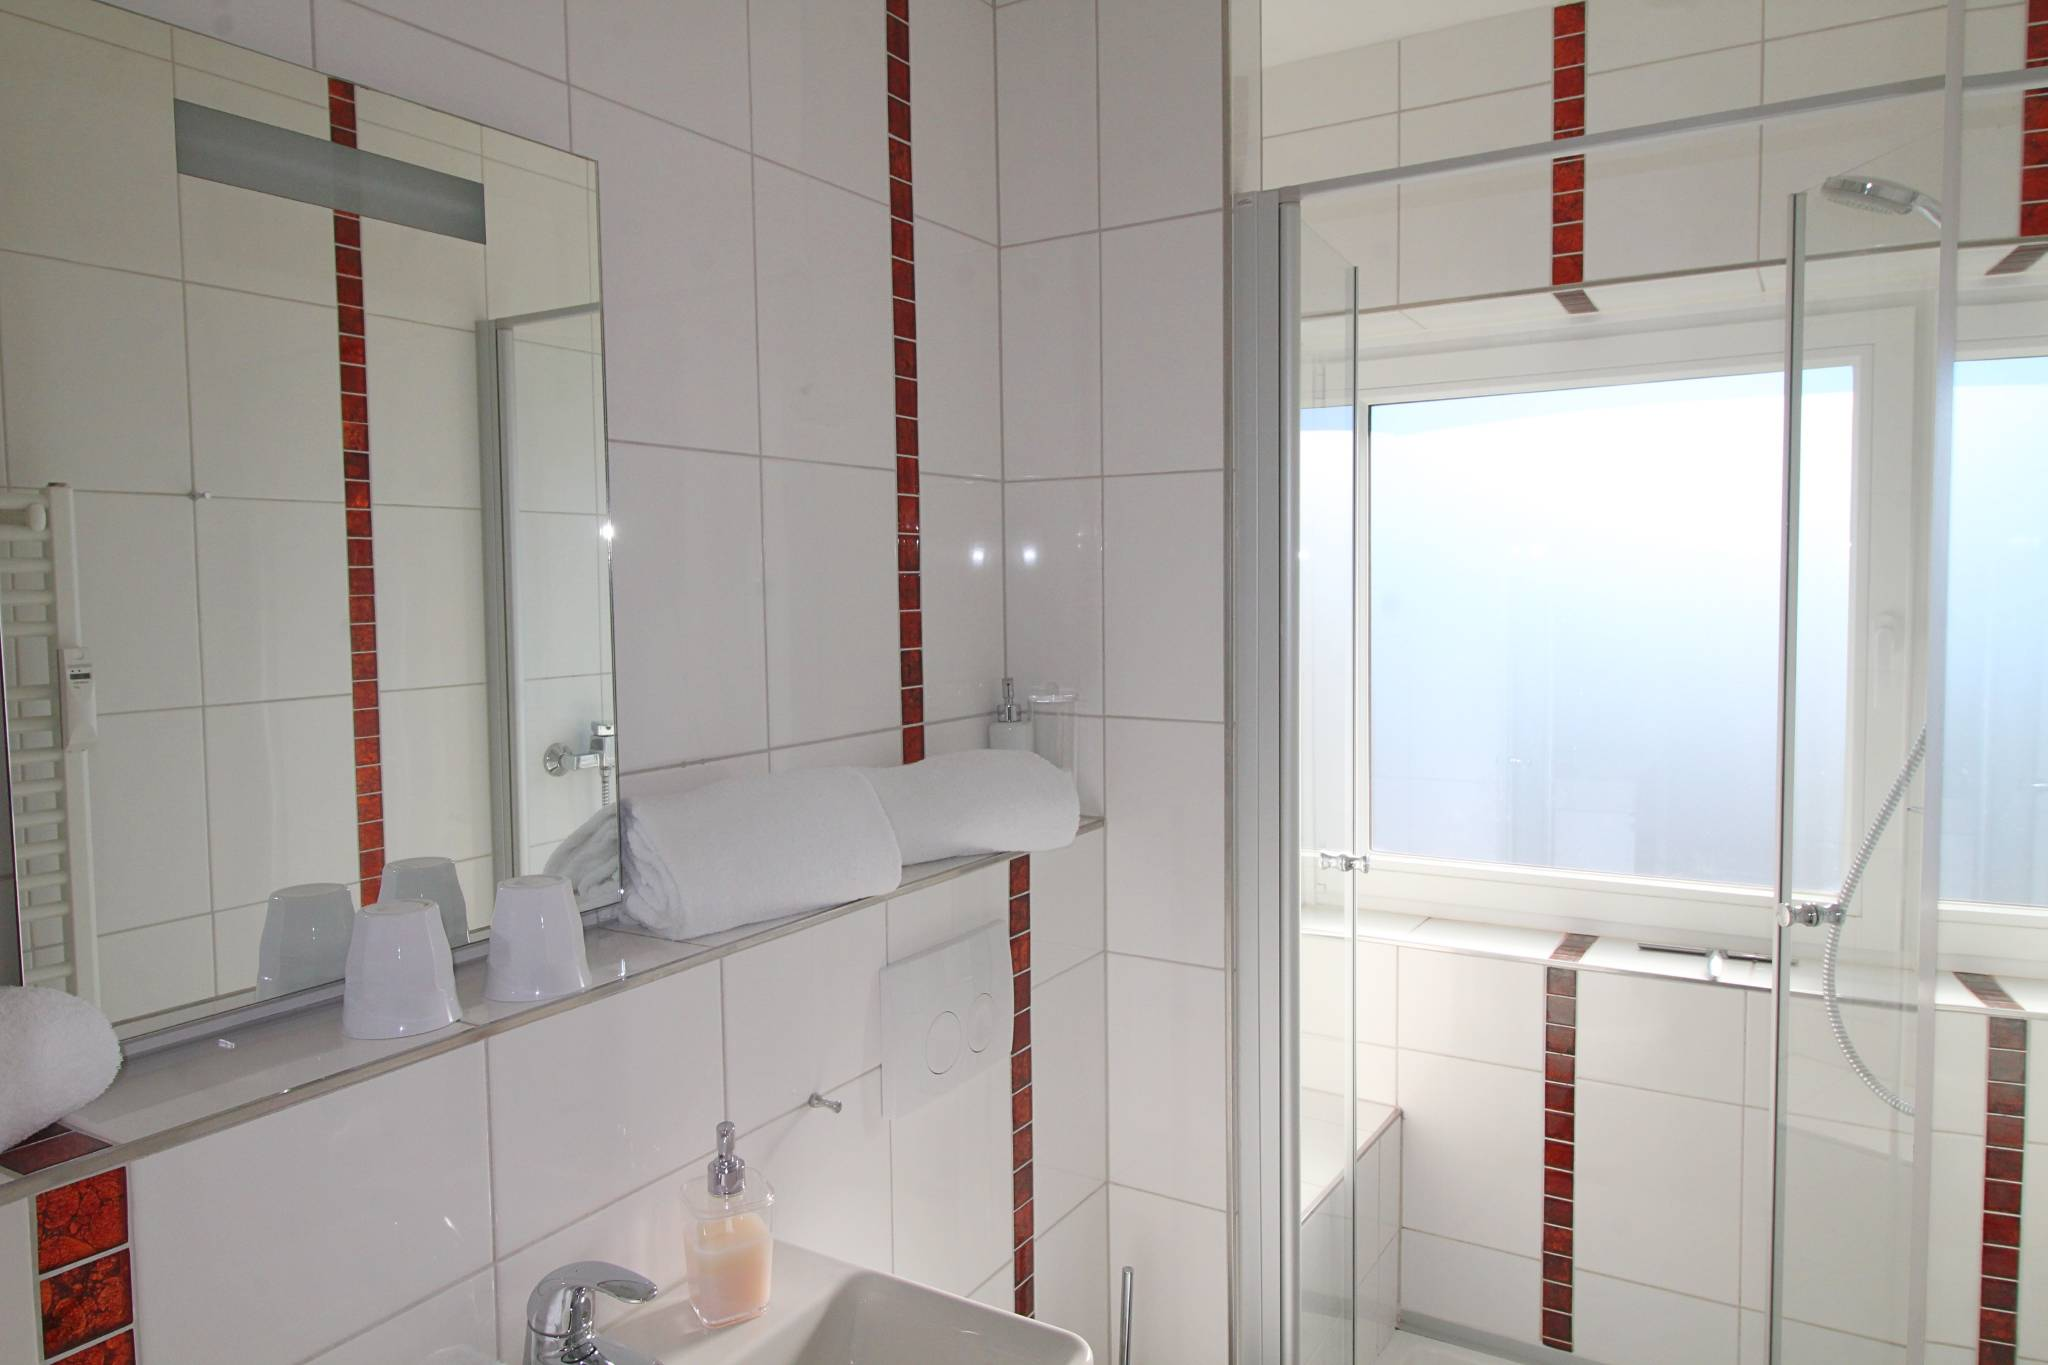 Badezimmer mit Glasdusche